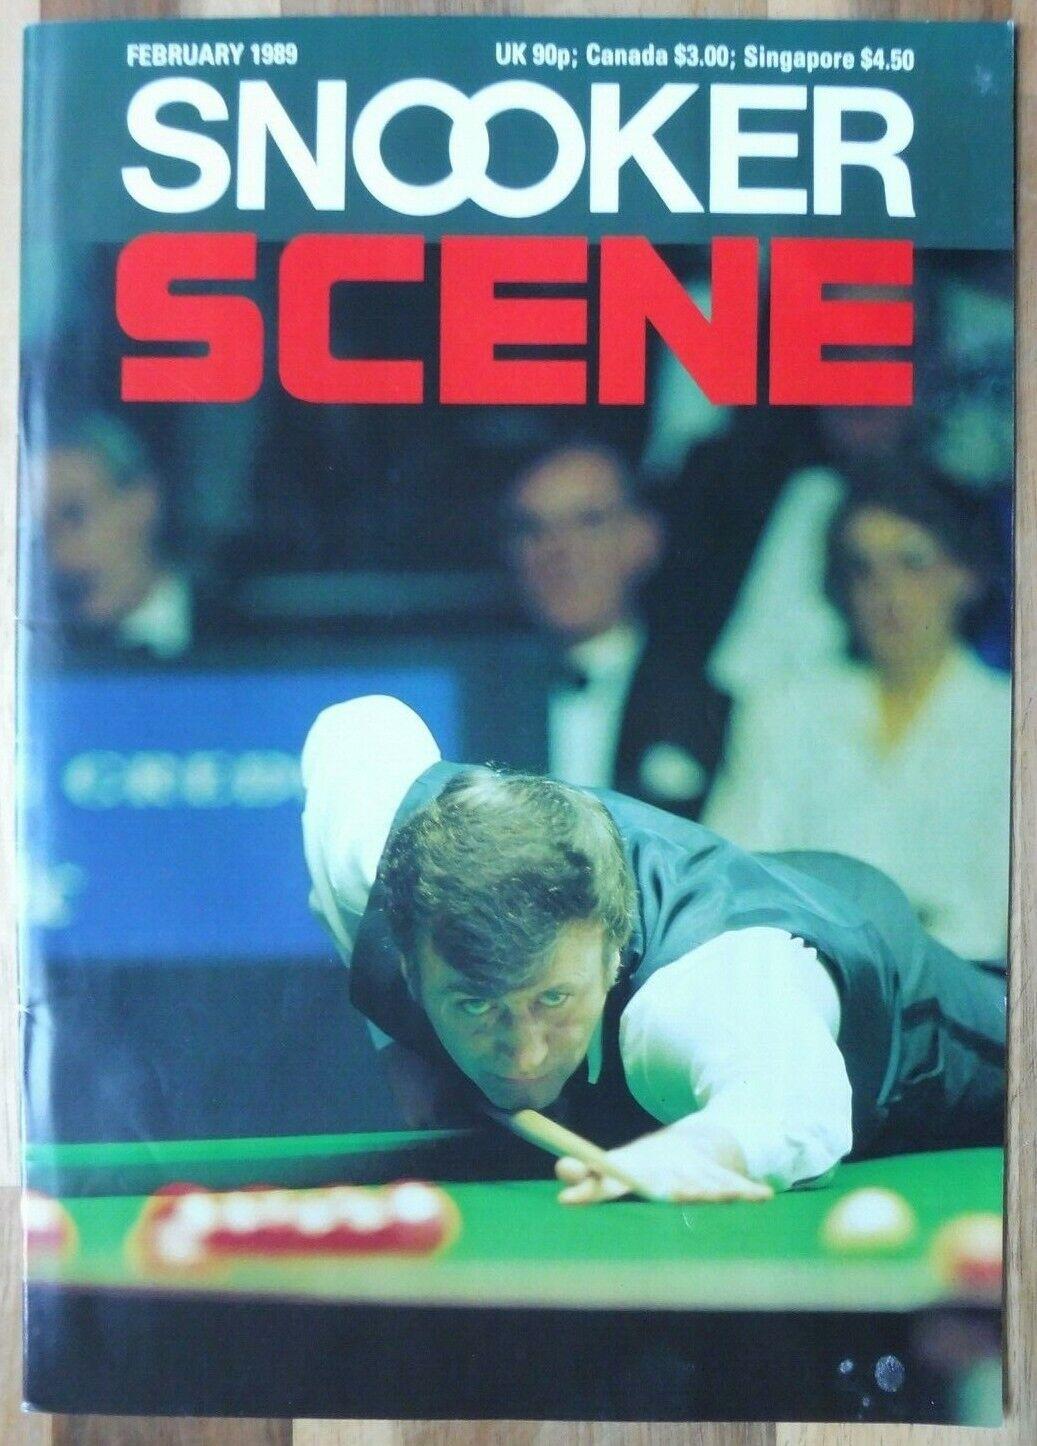 Snooker Scene Magazine, February 1989, Good Condition.